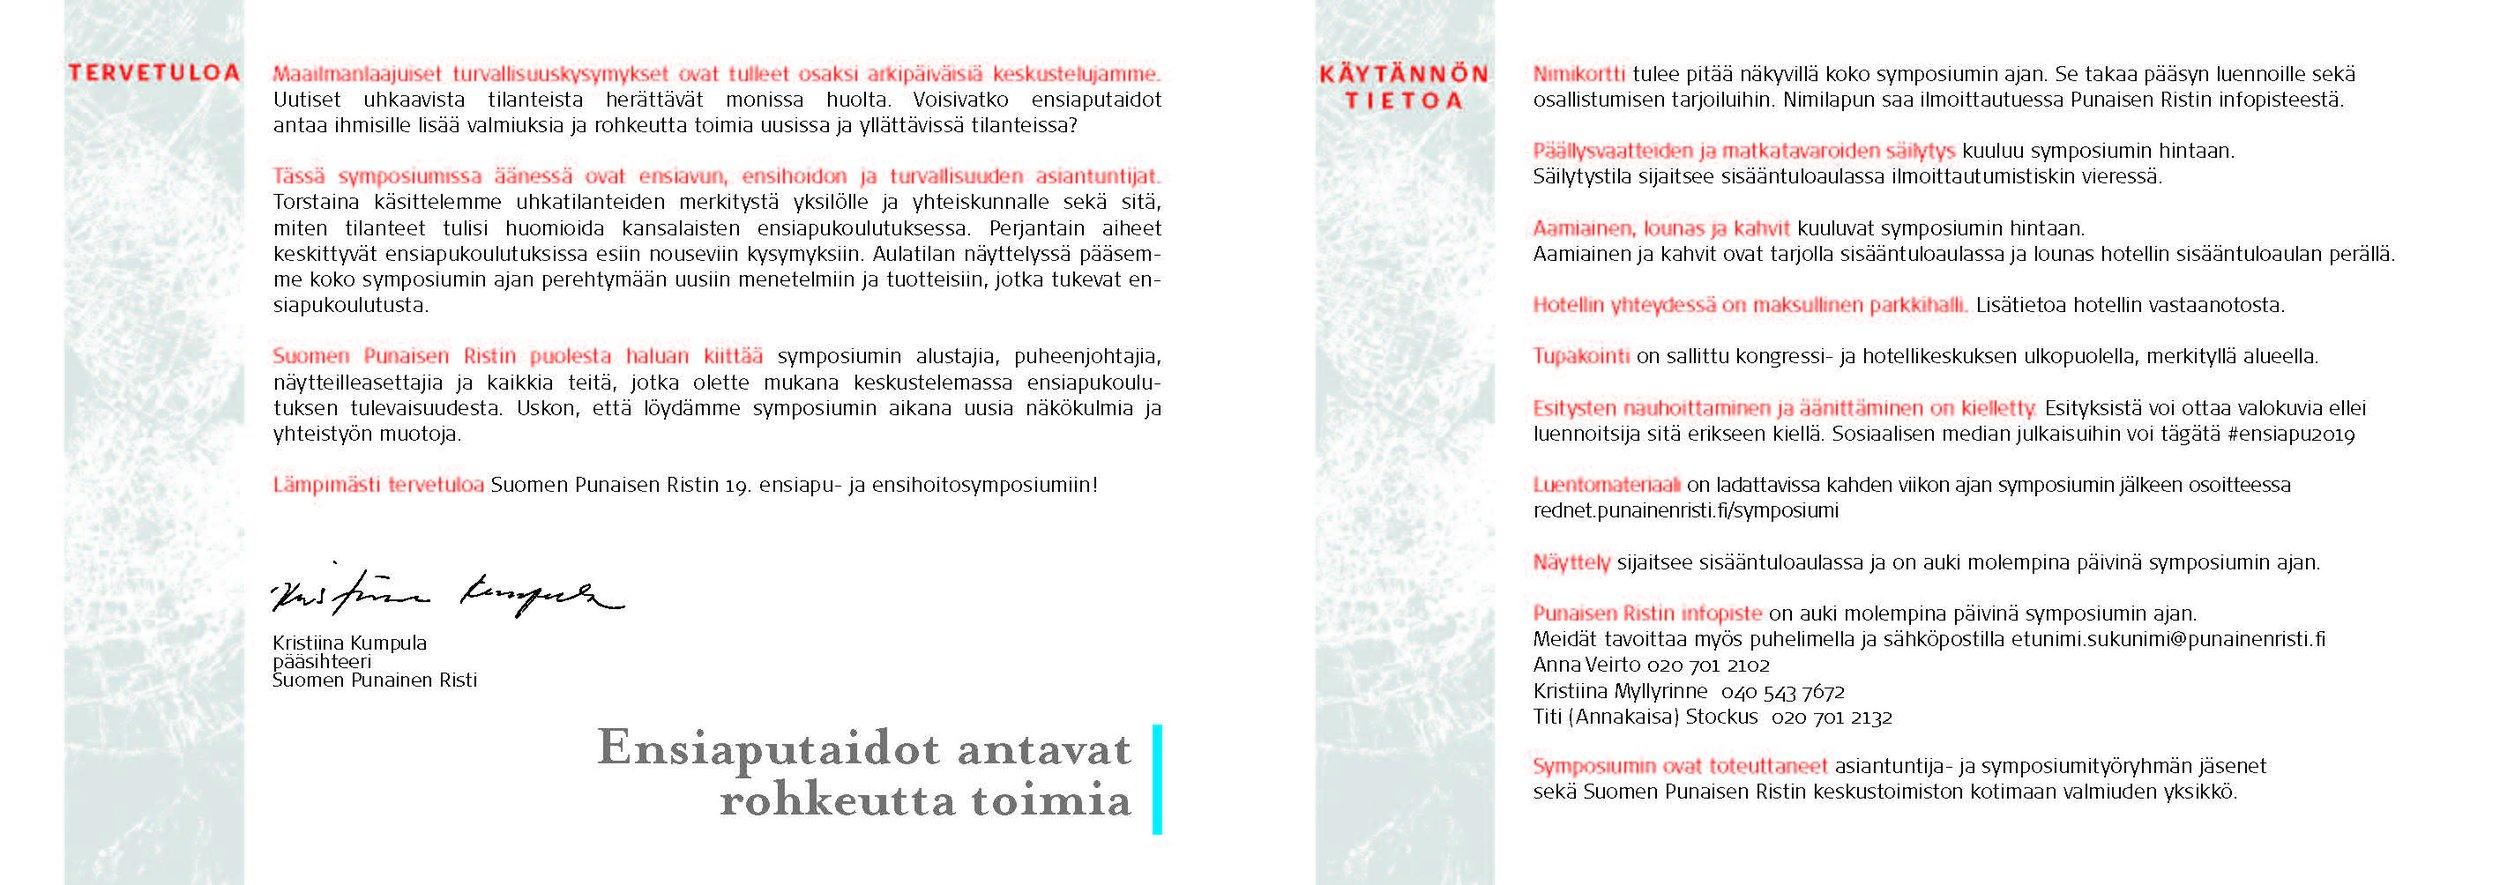 Symposium ohjelma 2019_Page_2.jpg